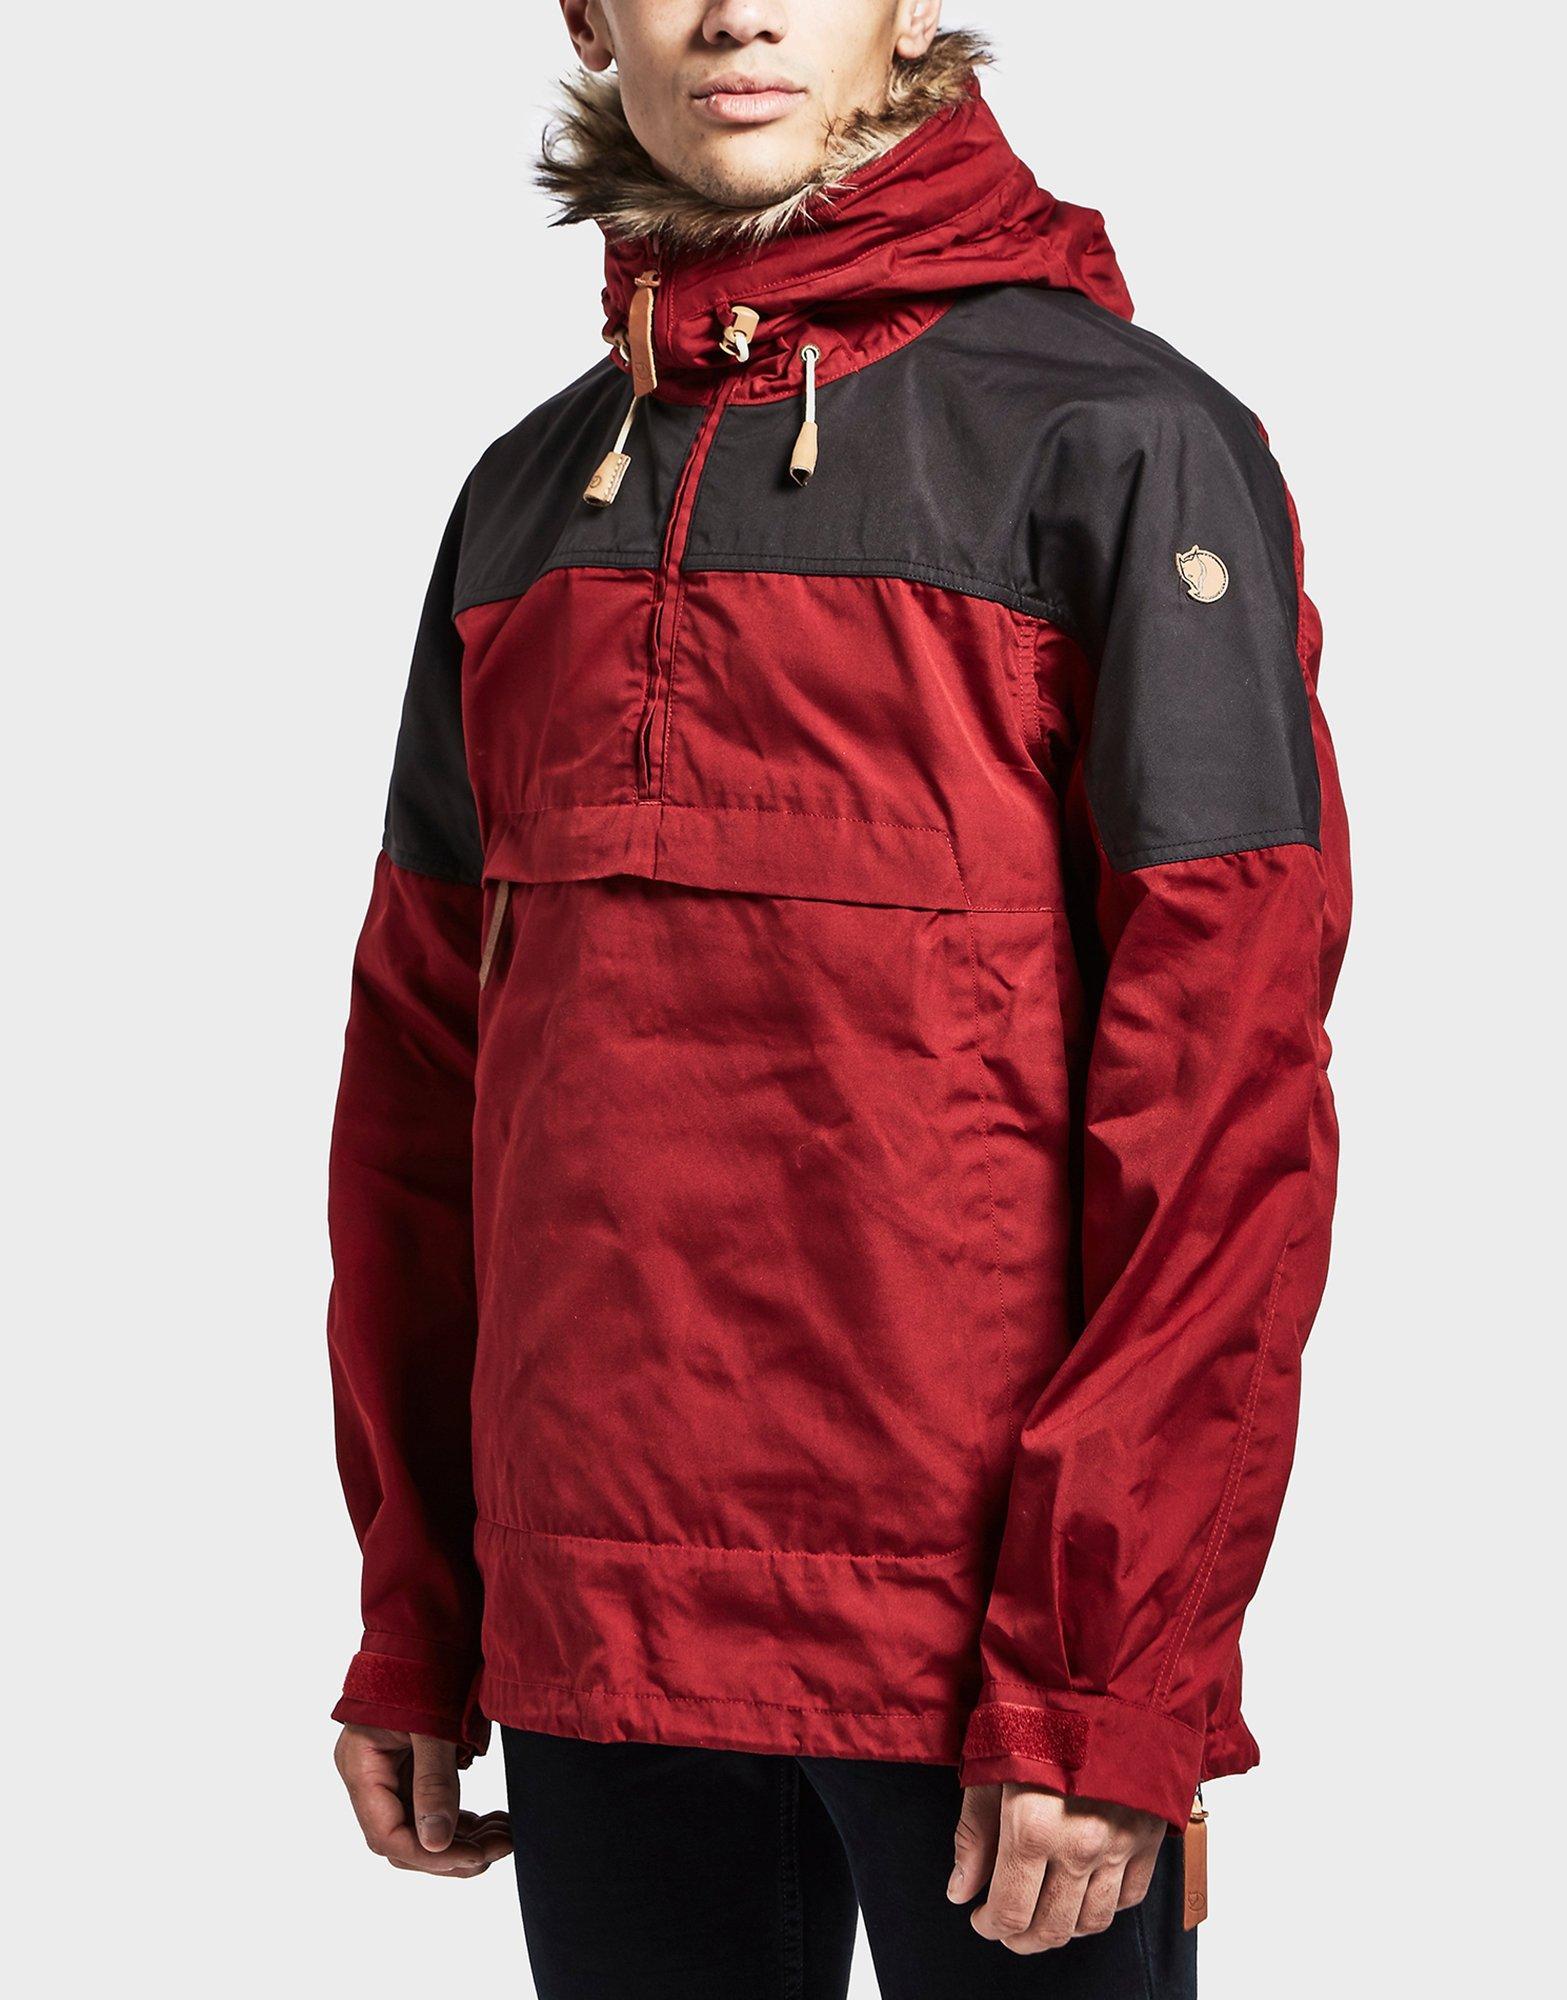 Fjallraven hooded parka coat with borg lining